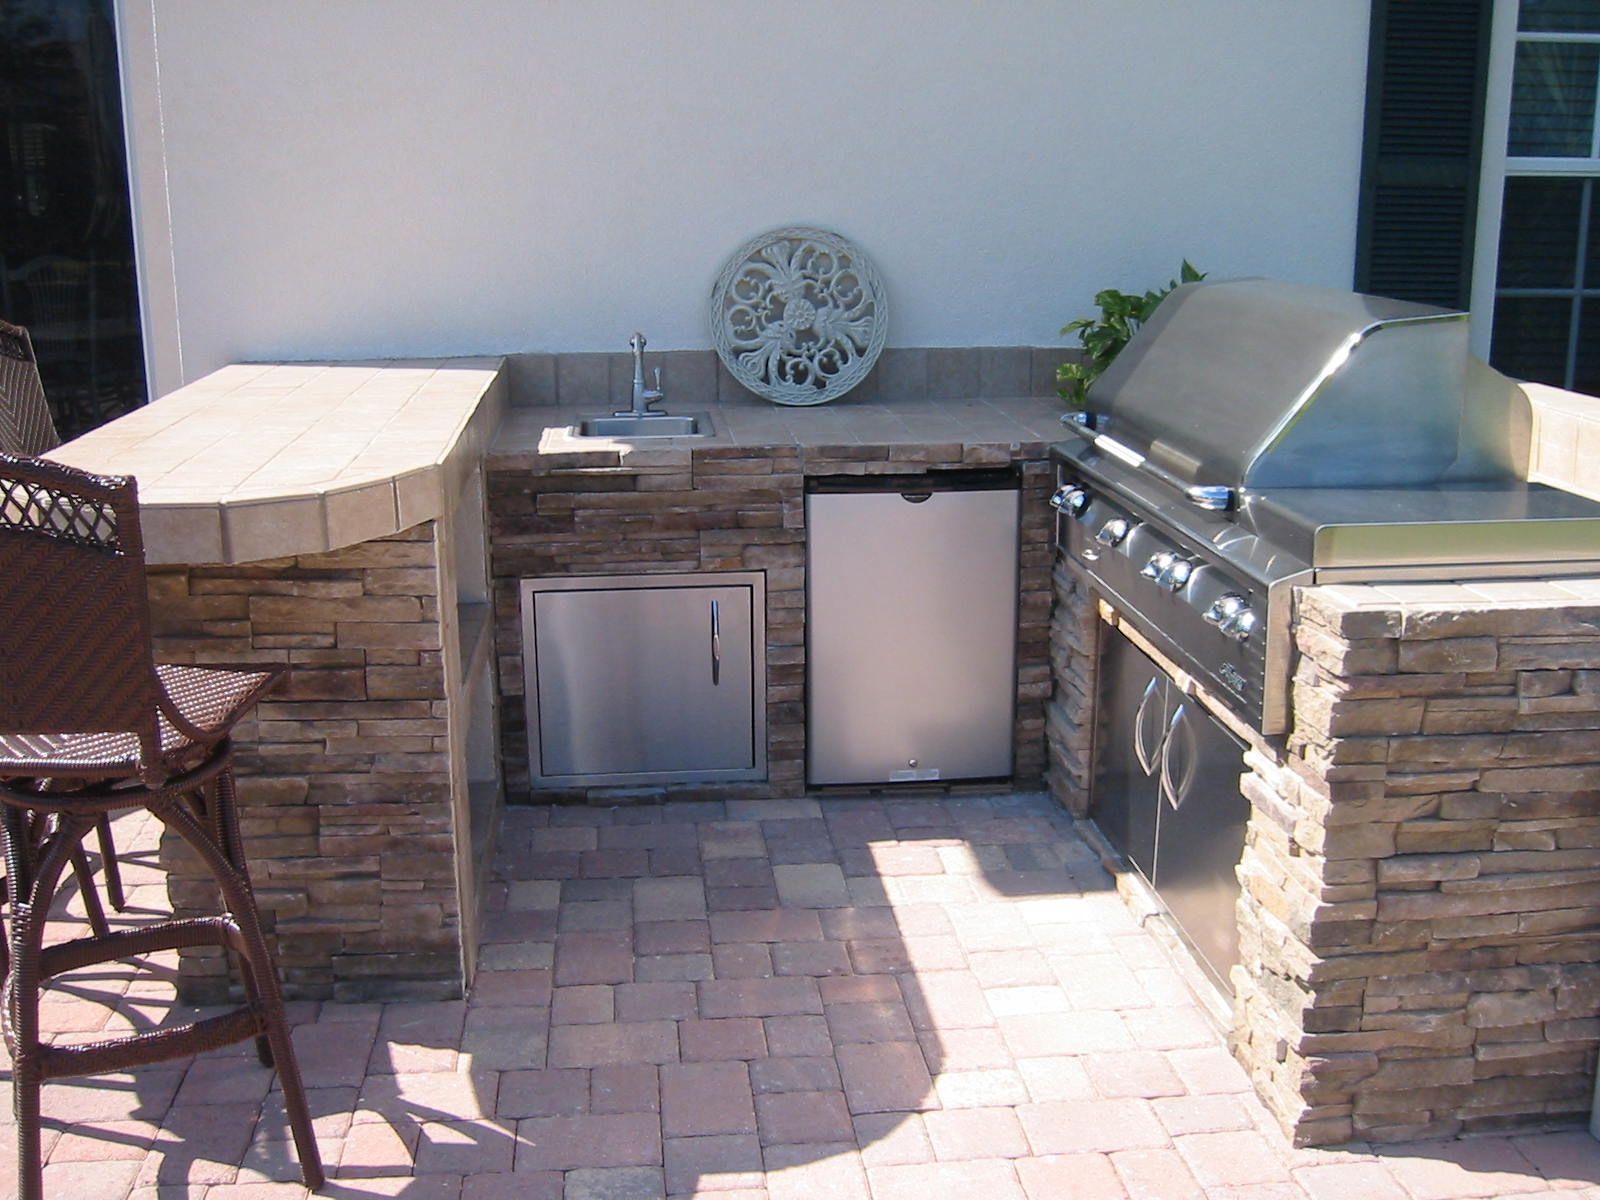 Outdoor Summer Kitchen Built In Outdoor Grill Designs Infrared Built In Outdoor Kitchen